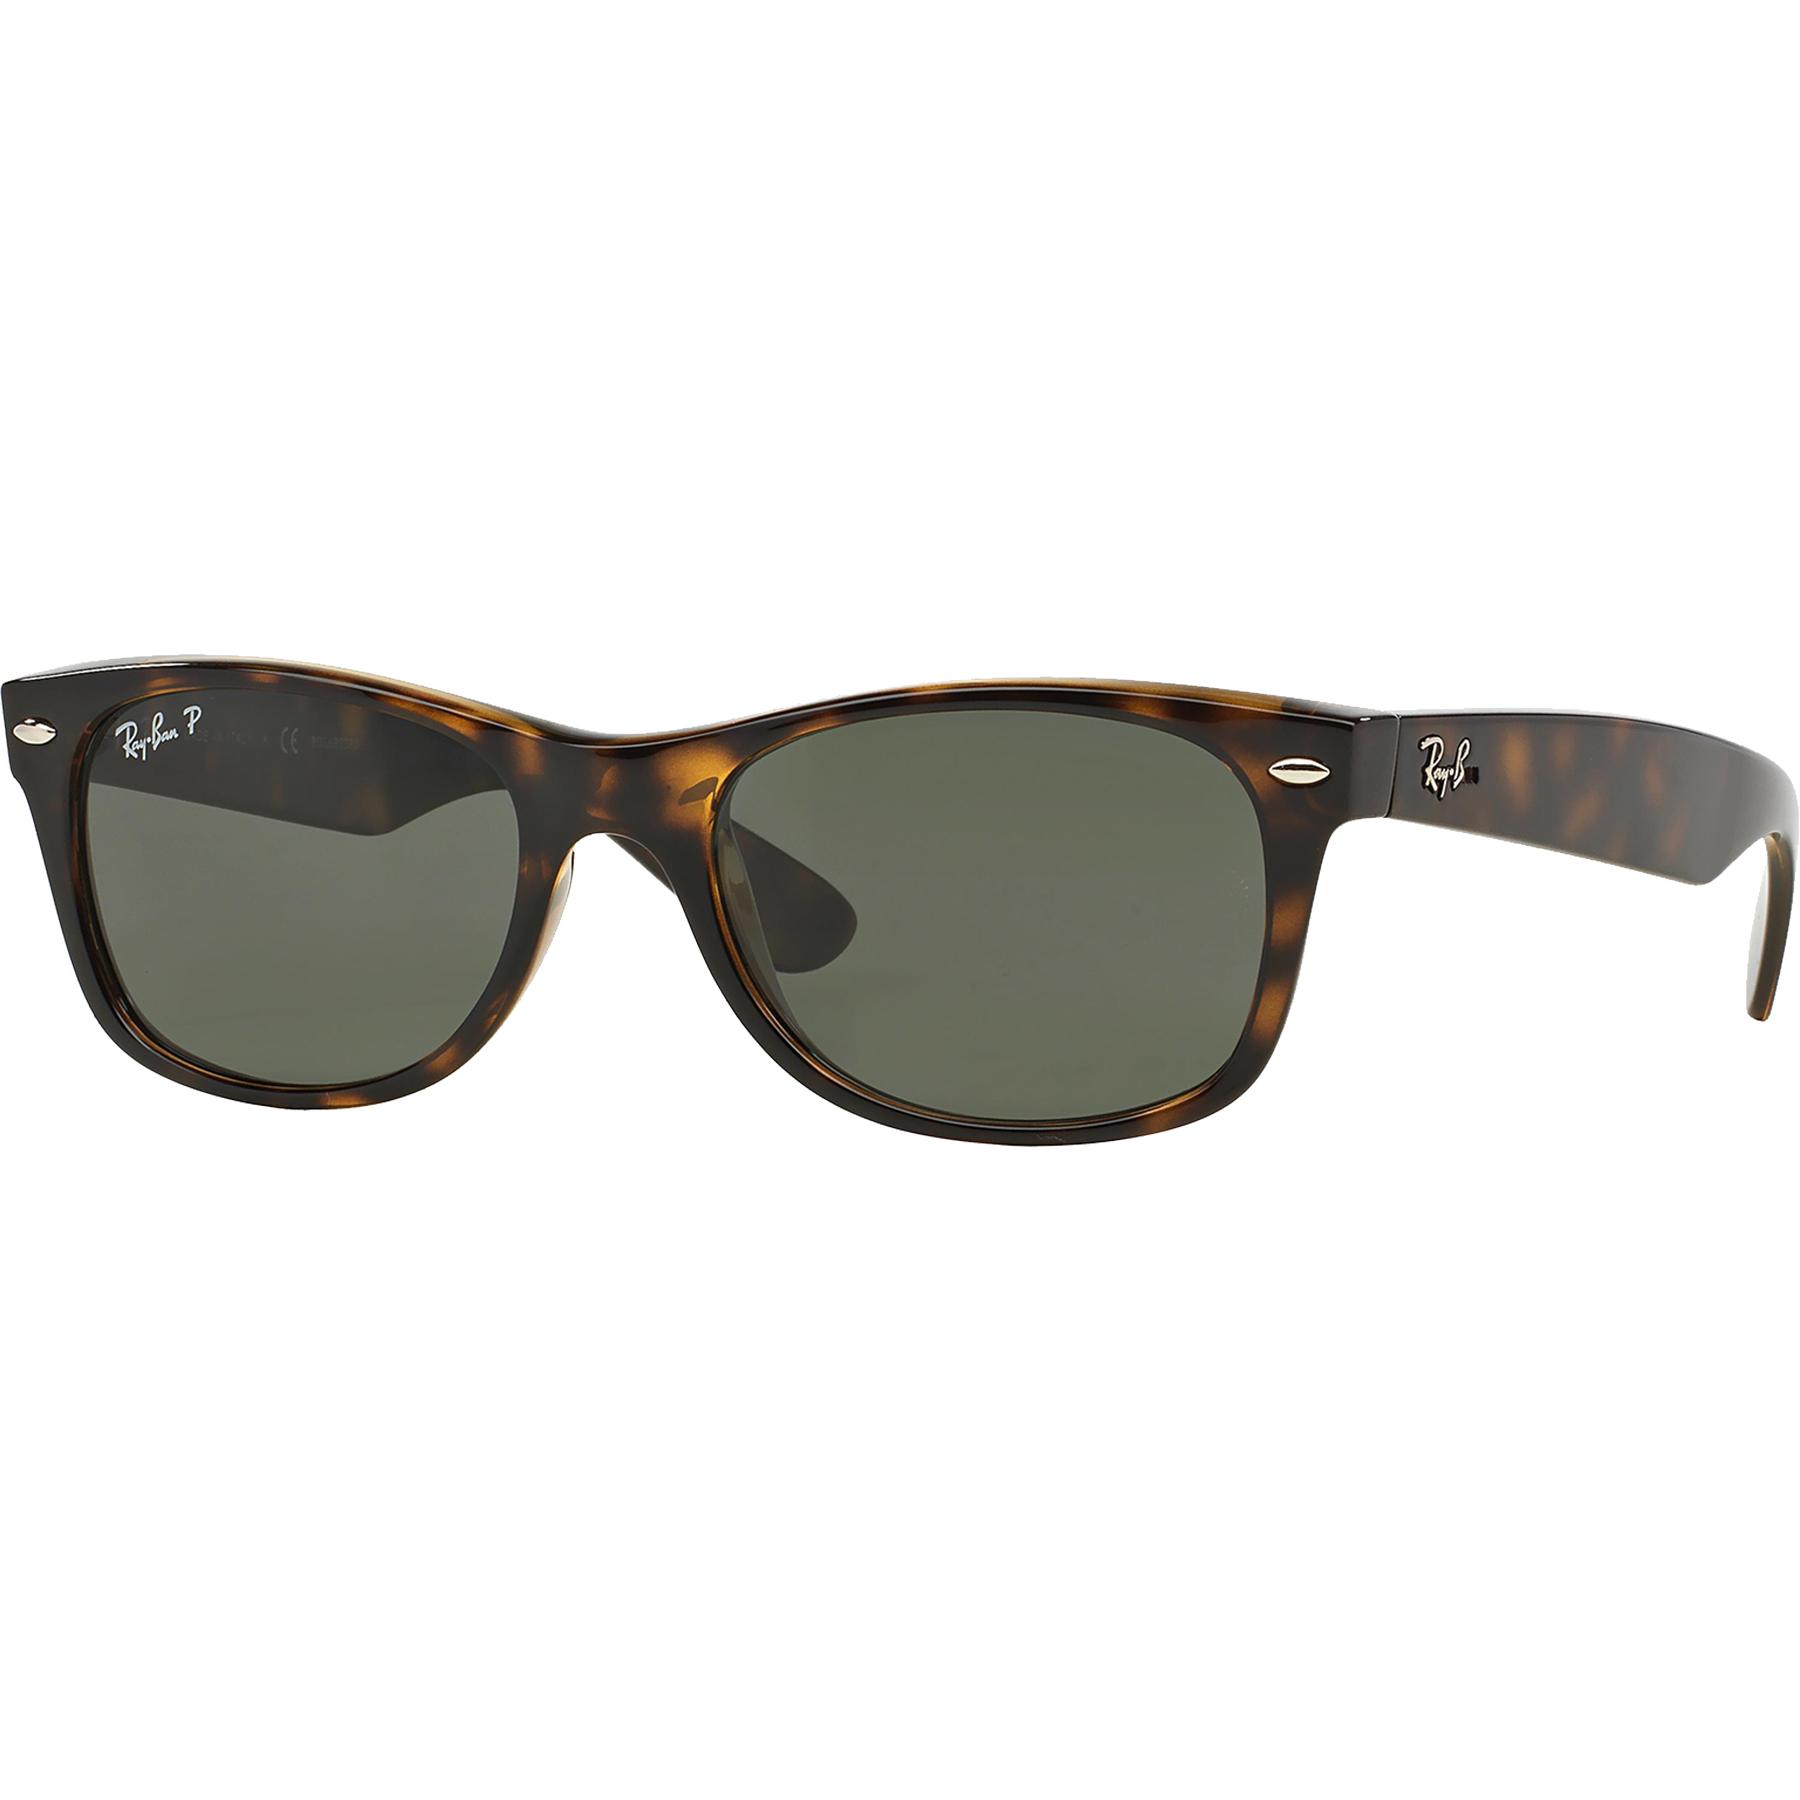 705aebc5a0ef4 Ray-Ban Polarized New Wayfarer Sunglasses - Tortoise Green ...